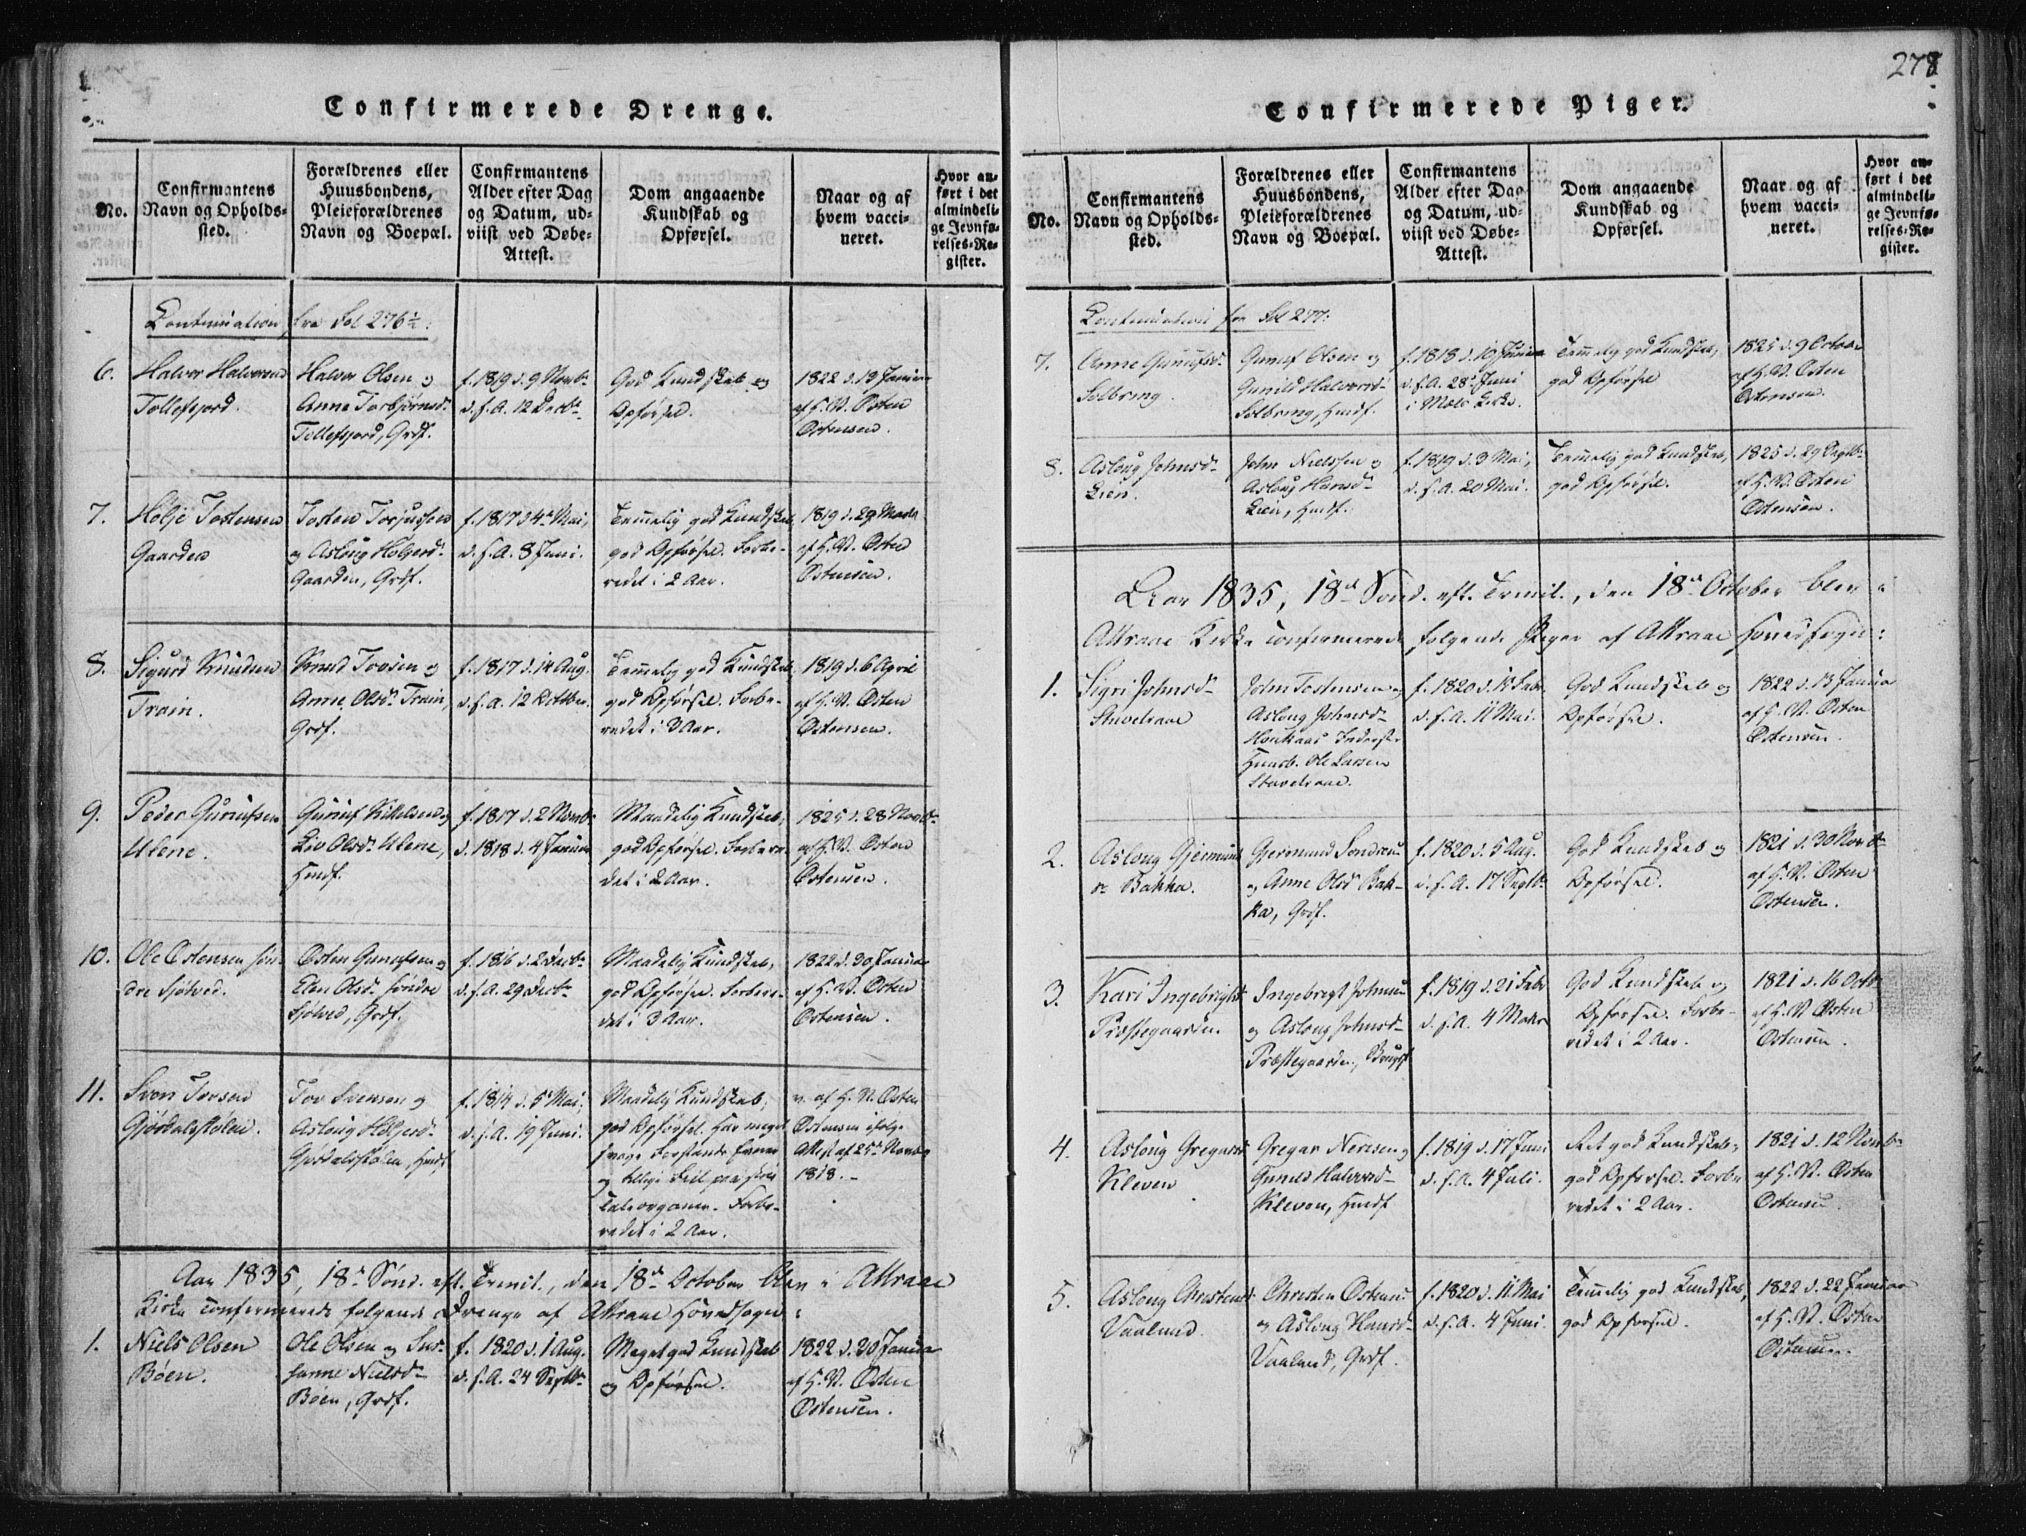 SAKO, Tinn kirkebøker, F/Fa/L0004: Ministerialbok nr. I 4, 1815-1843, s. 278